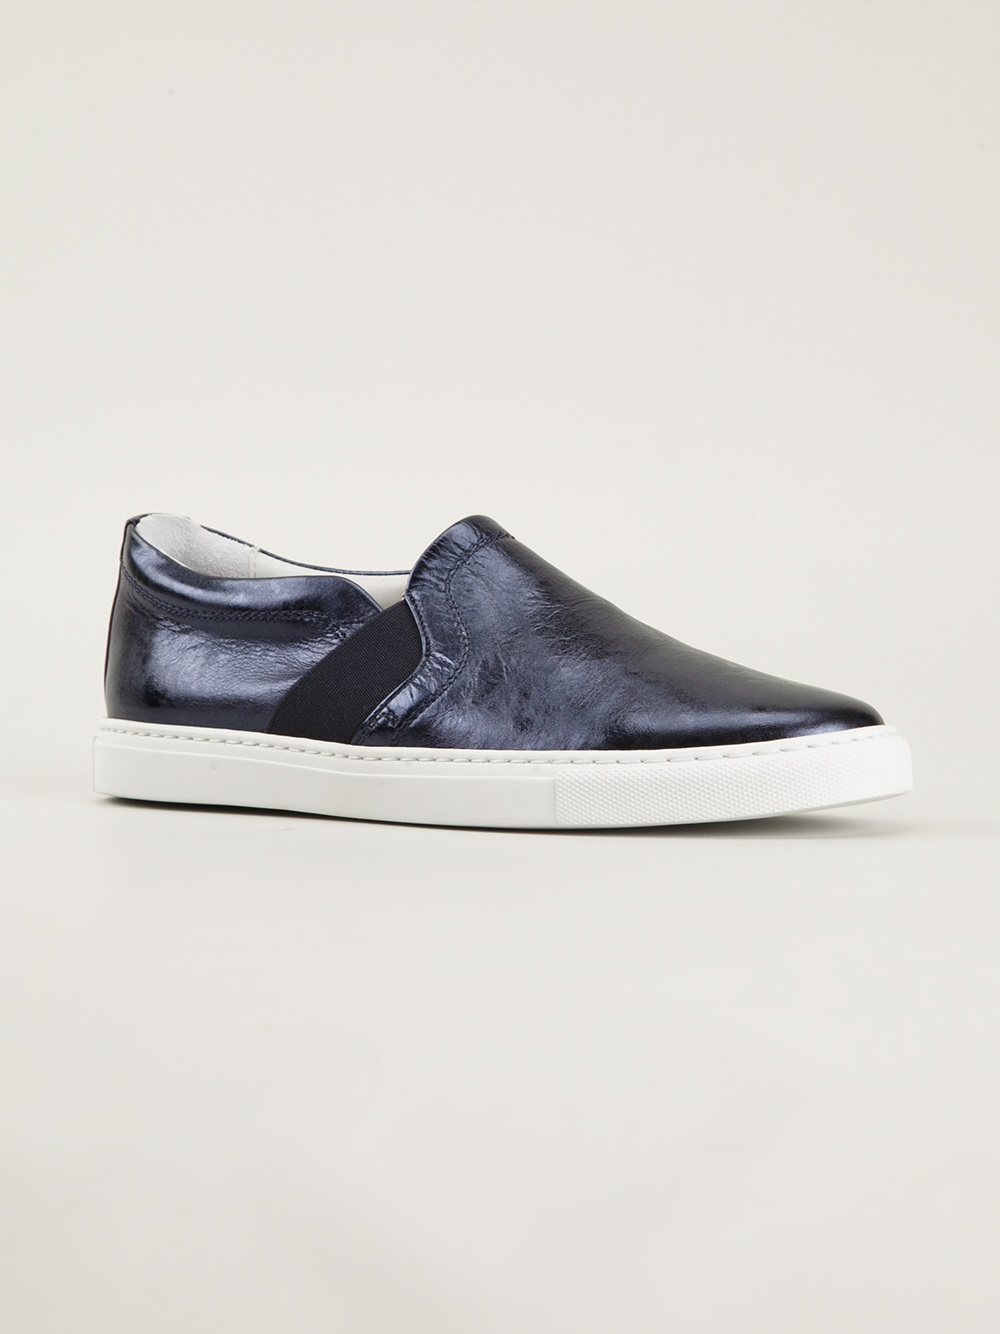 53264a761f71e4 Lanvin Metallic Skate Sneakers in Blue - Lyst